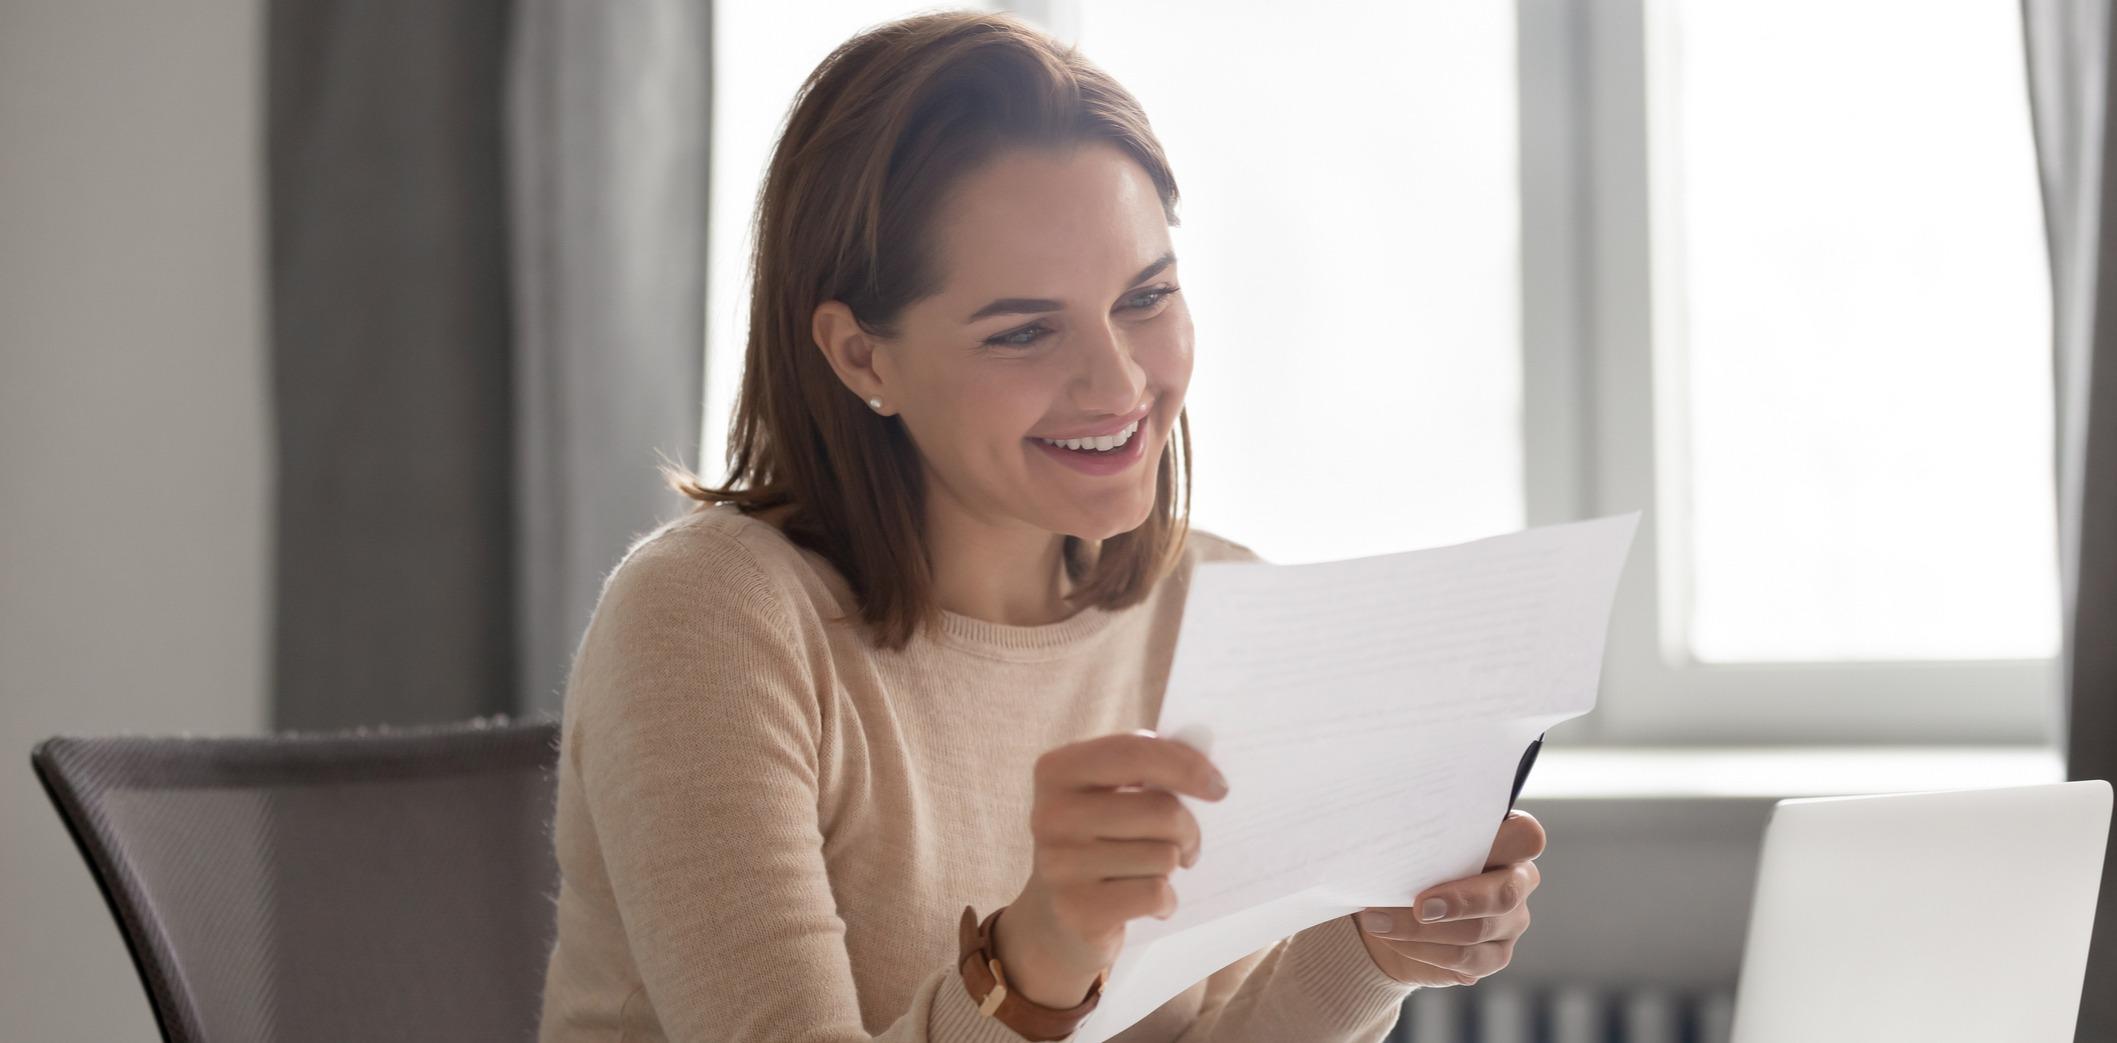 3 Useful Company Employee Benefits Policies for High Earners